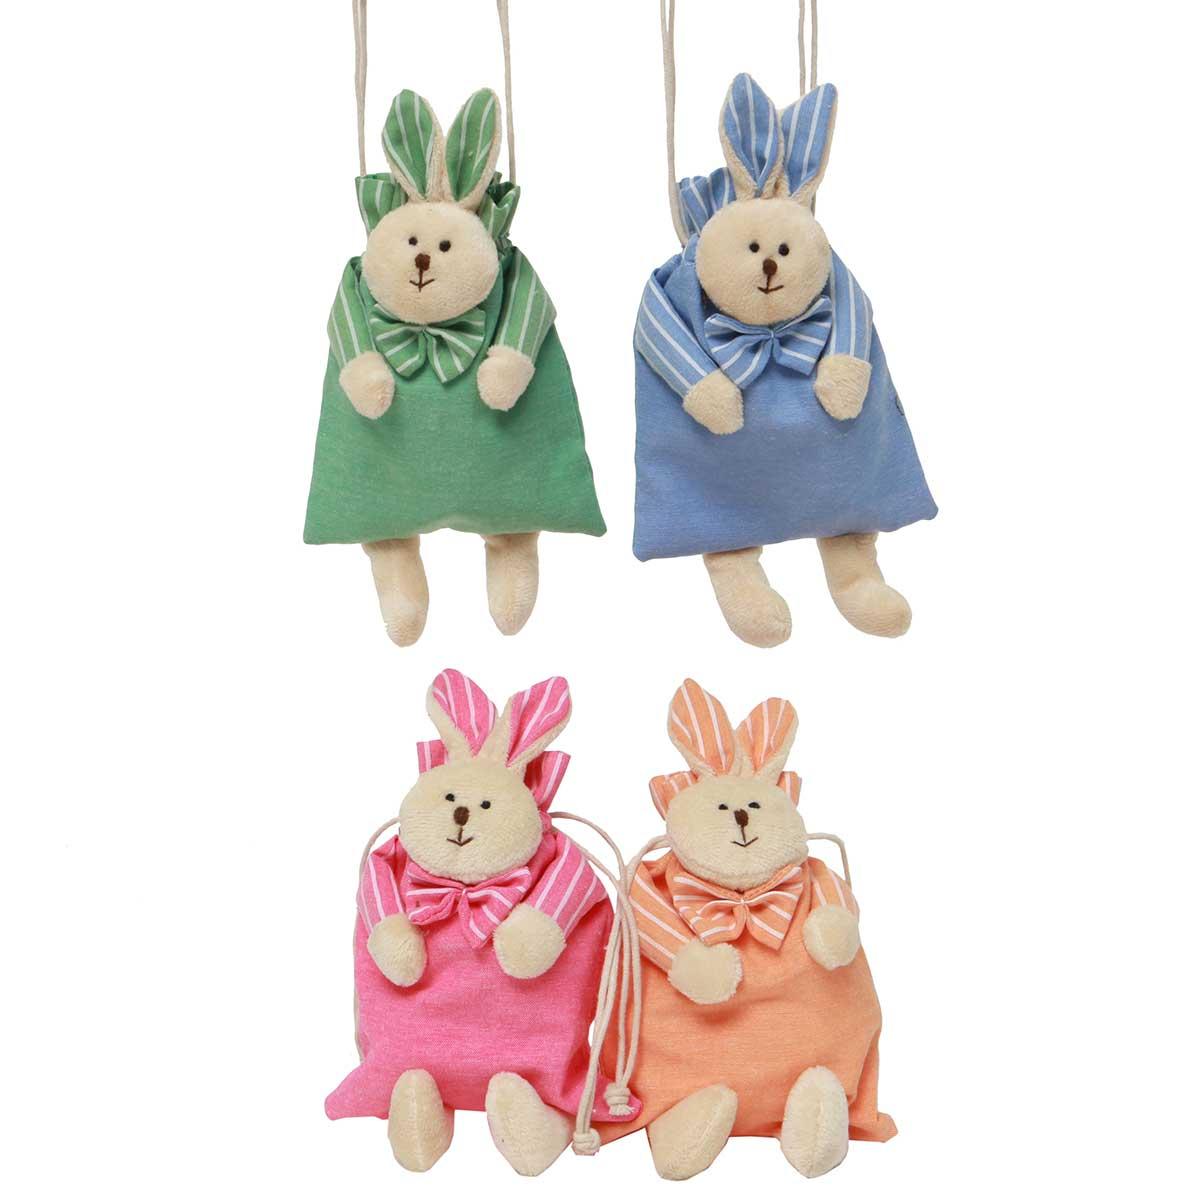 Itty-Bitty Bunny Bag 5�x9� 4 Assorted T3398 50%